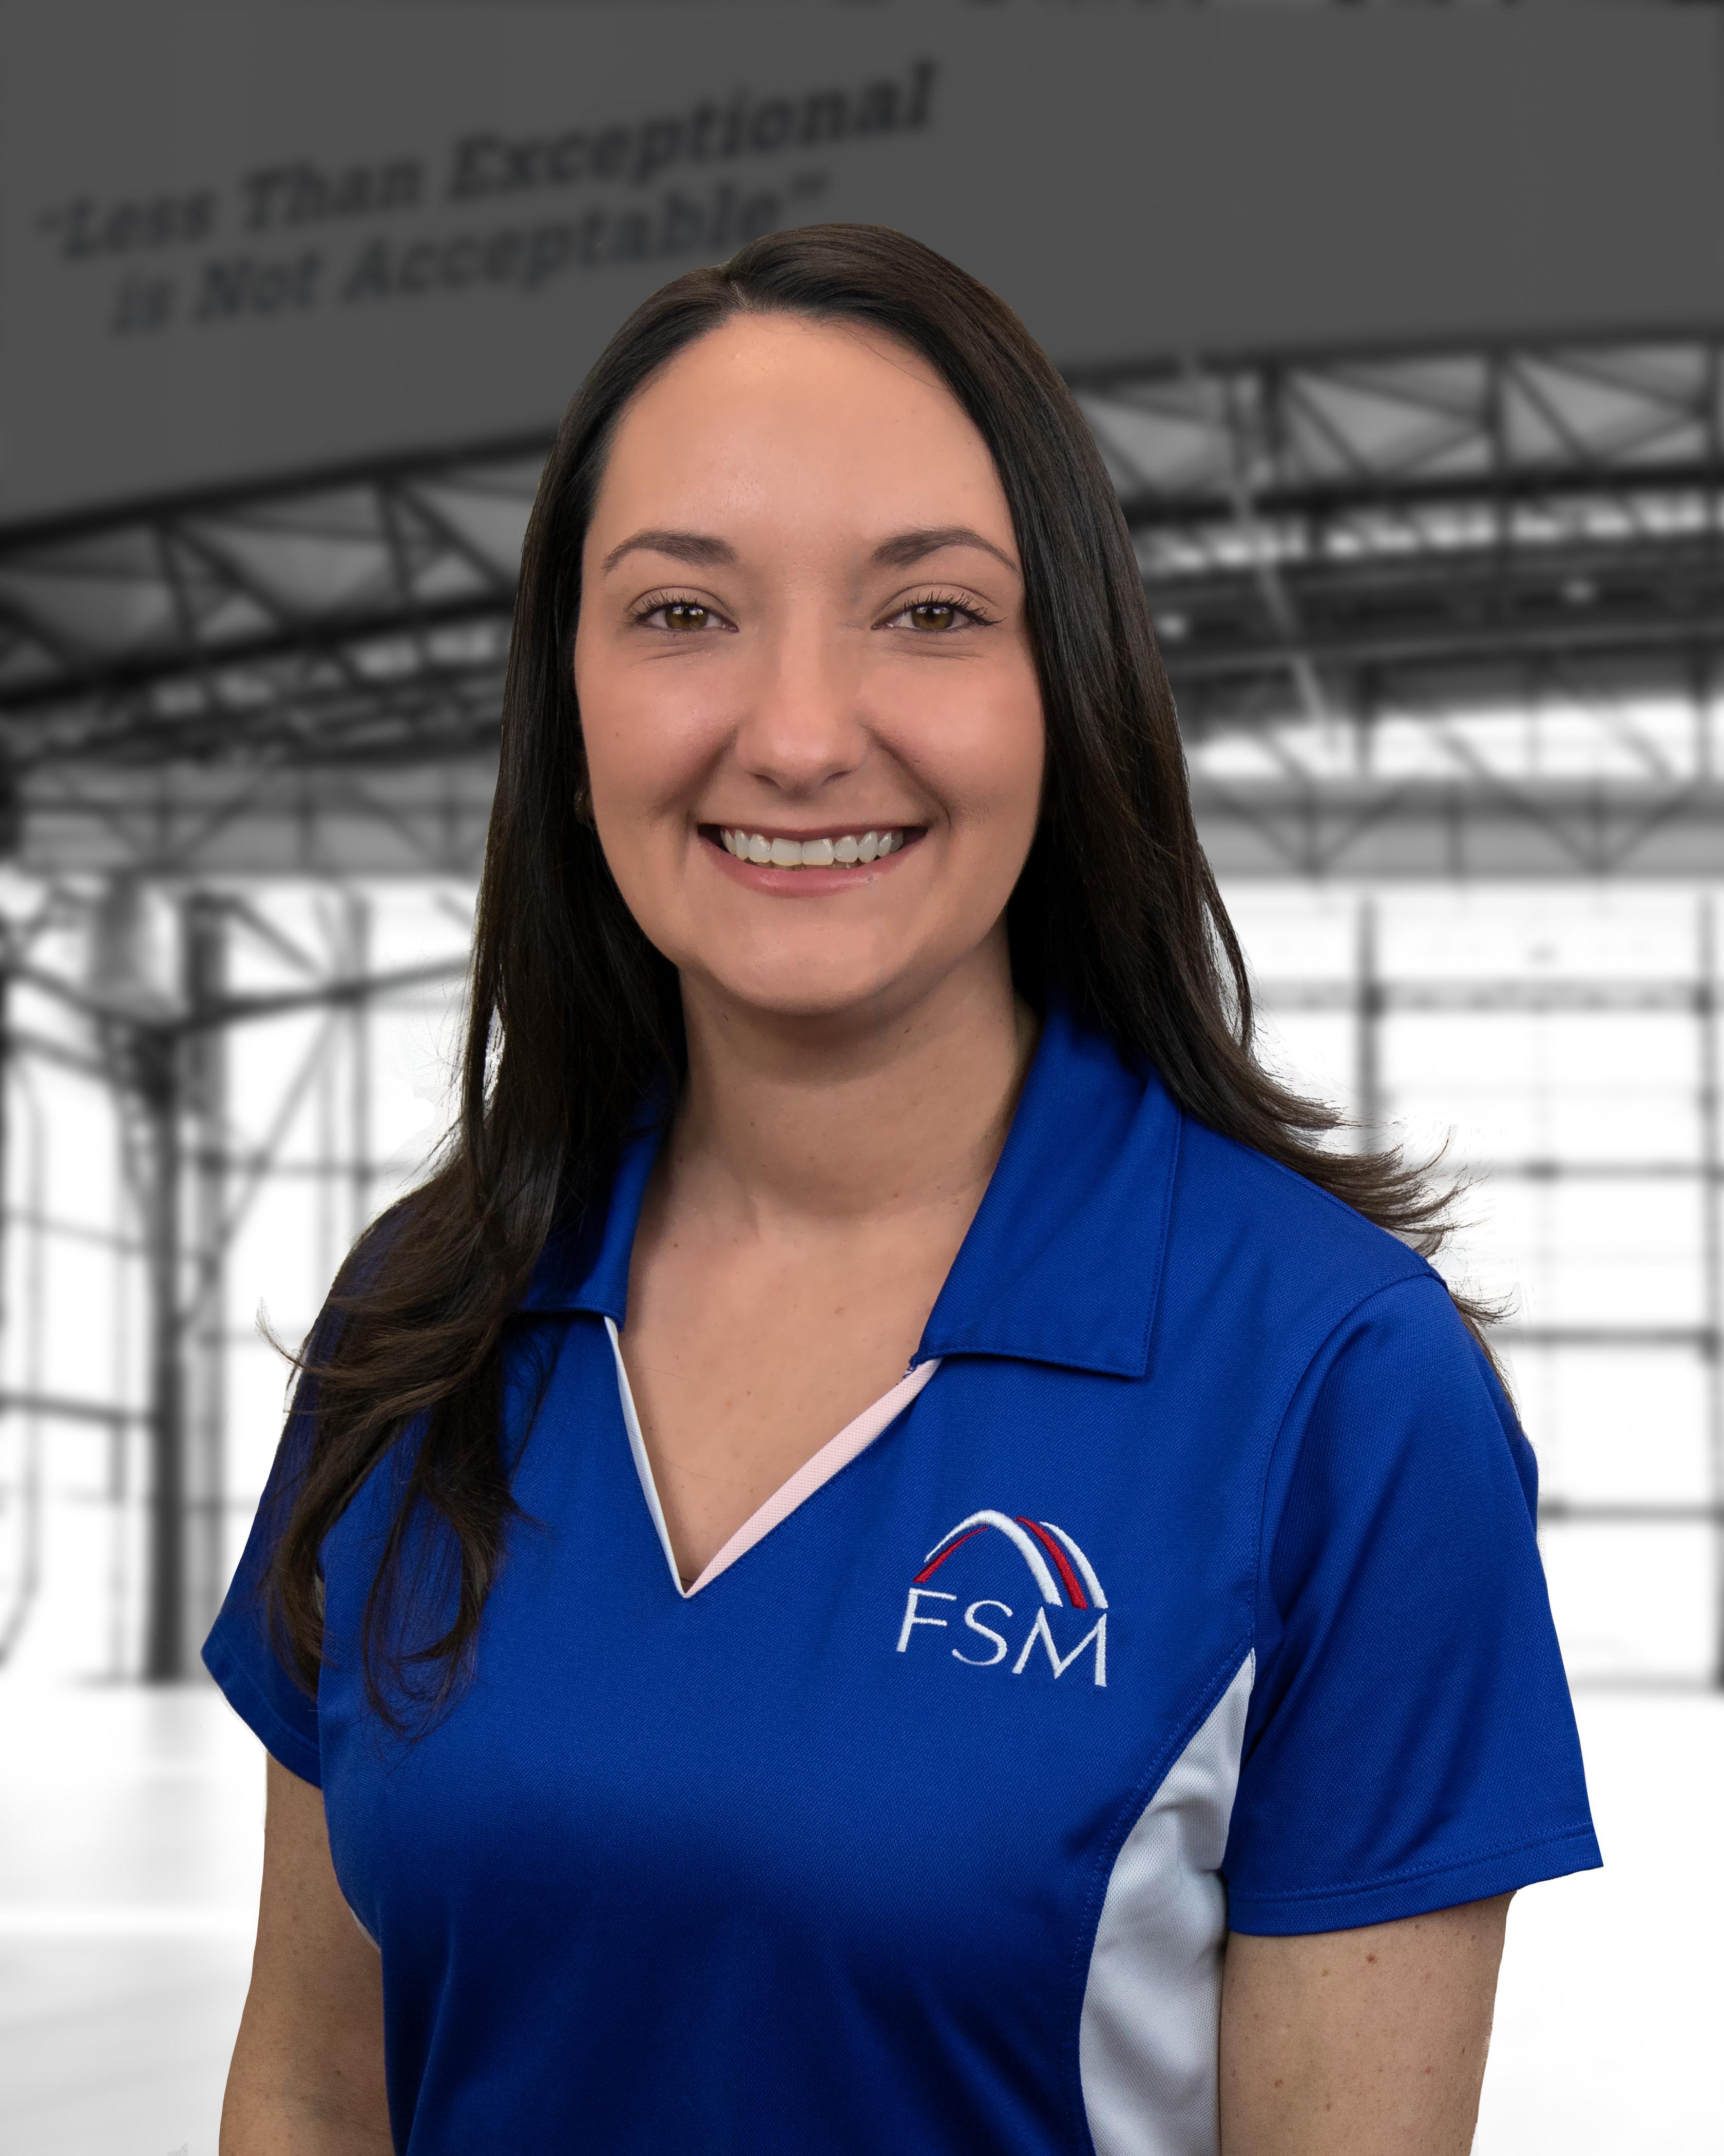 FSM Jenn Medina Customer Experience Advocate